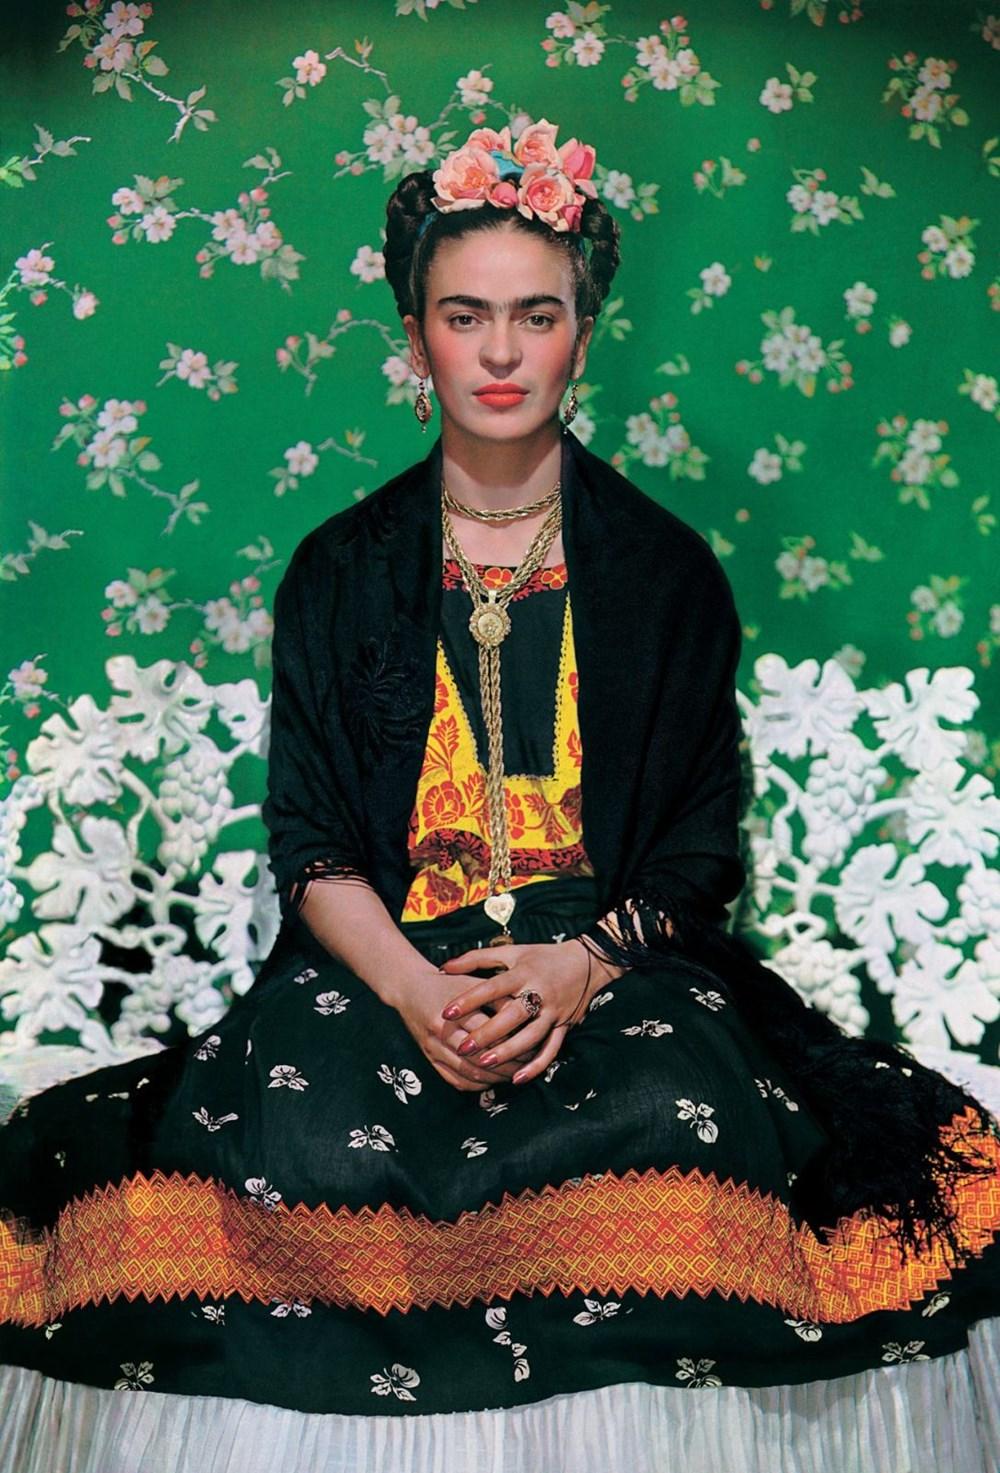 Frida Kahlo kimdir? (Tahta Bacak Frida Kahlo'nun hayatı) - 16